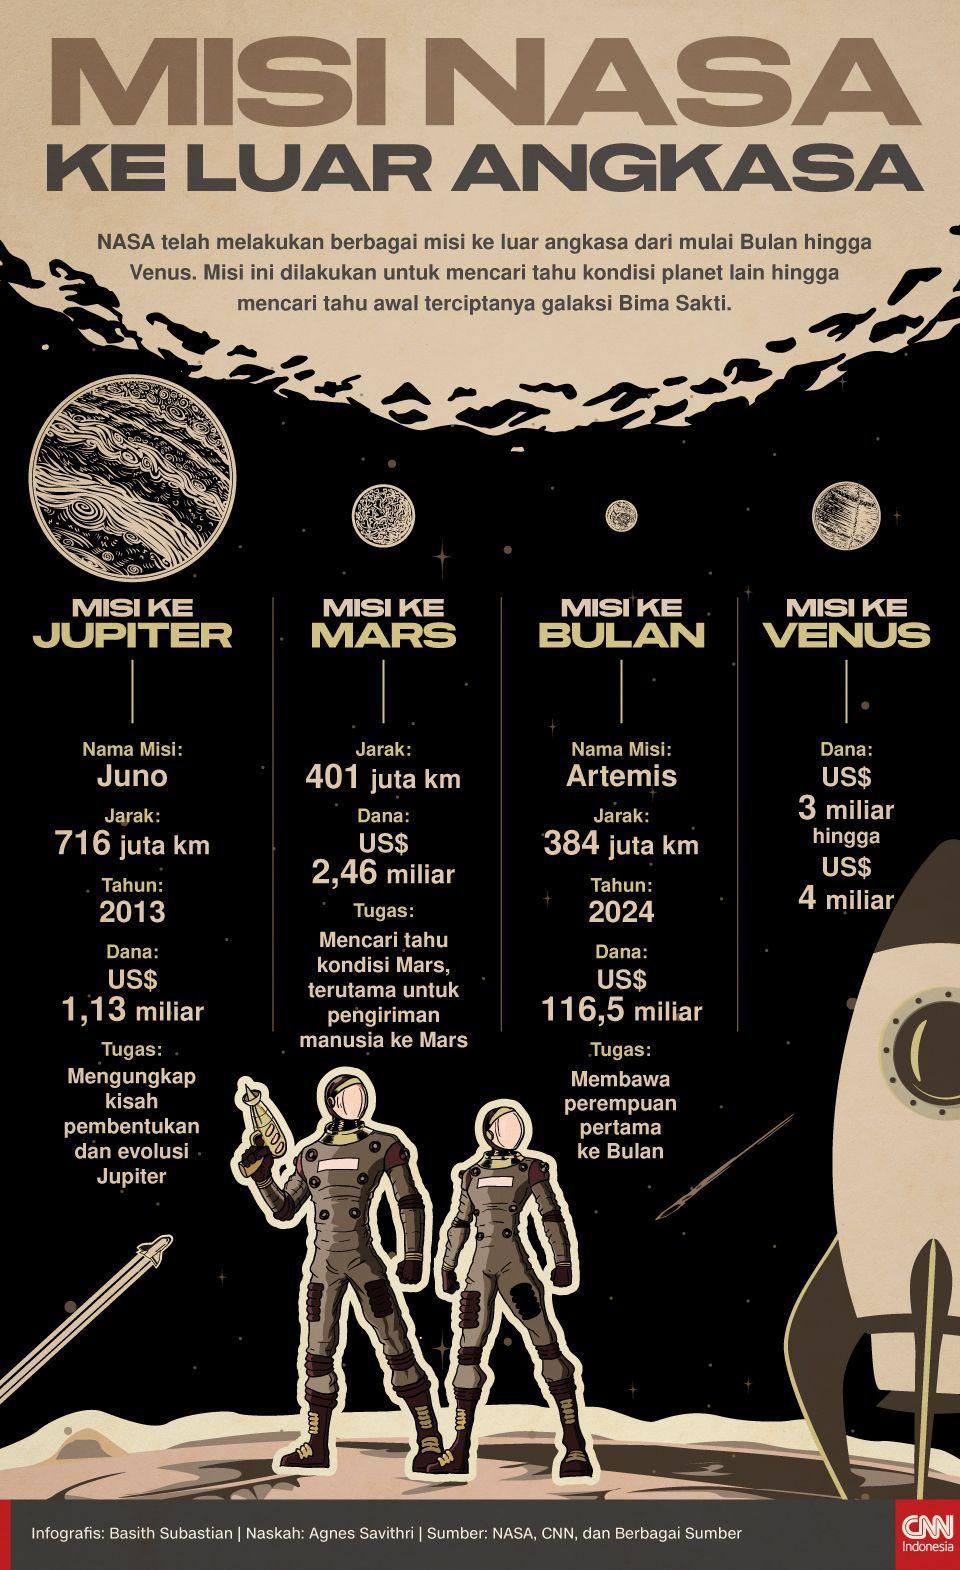 Infografis Misi NASA ke Luar Angkasa